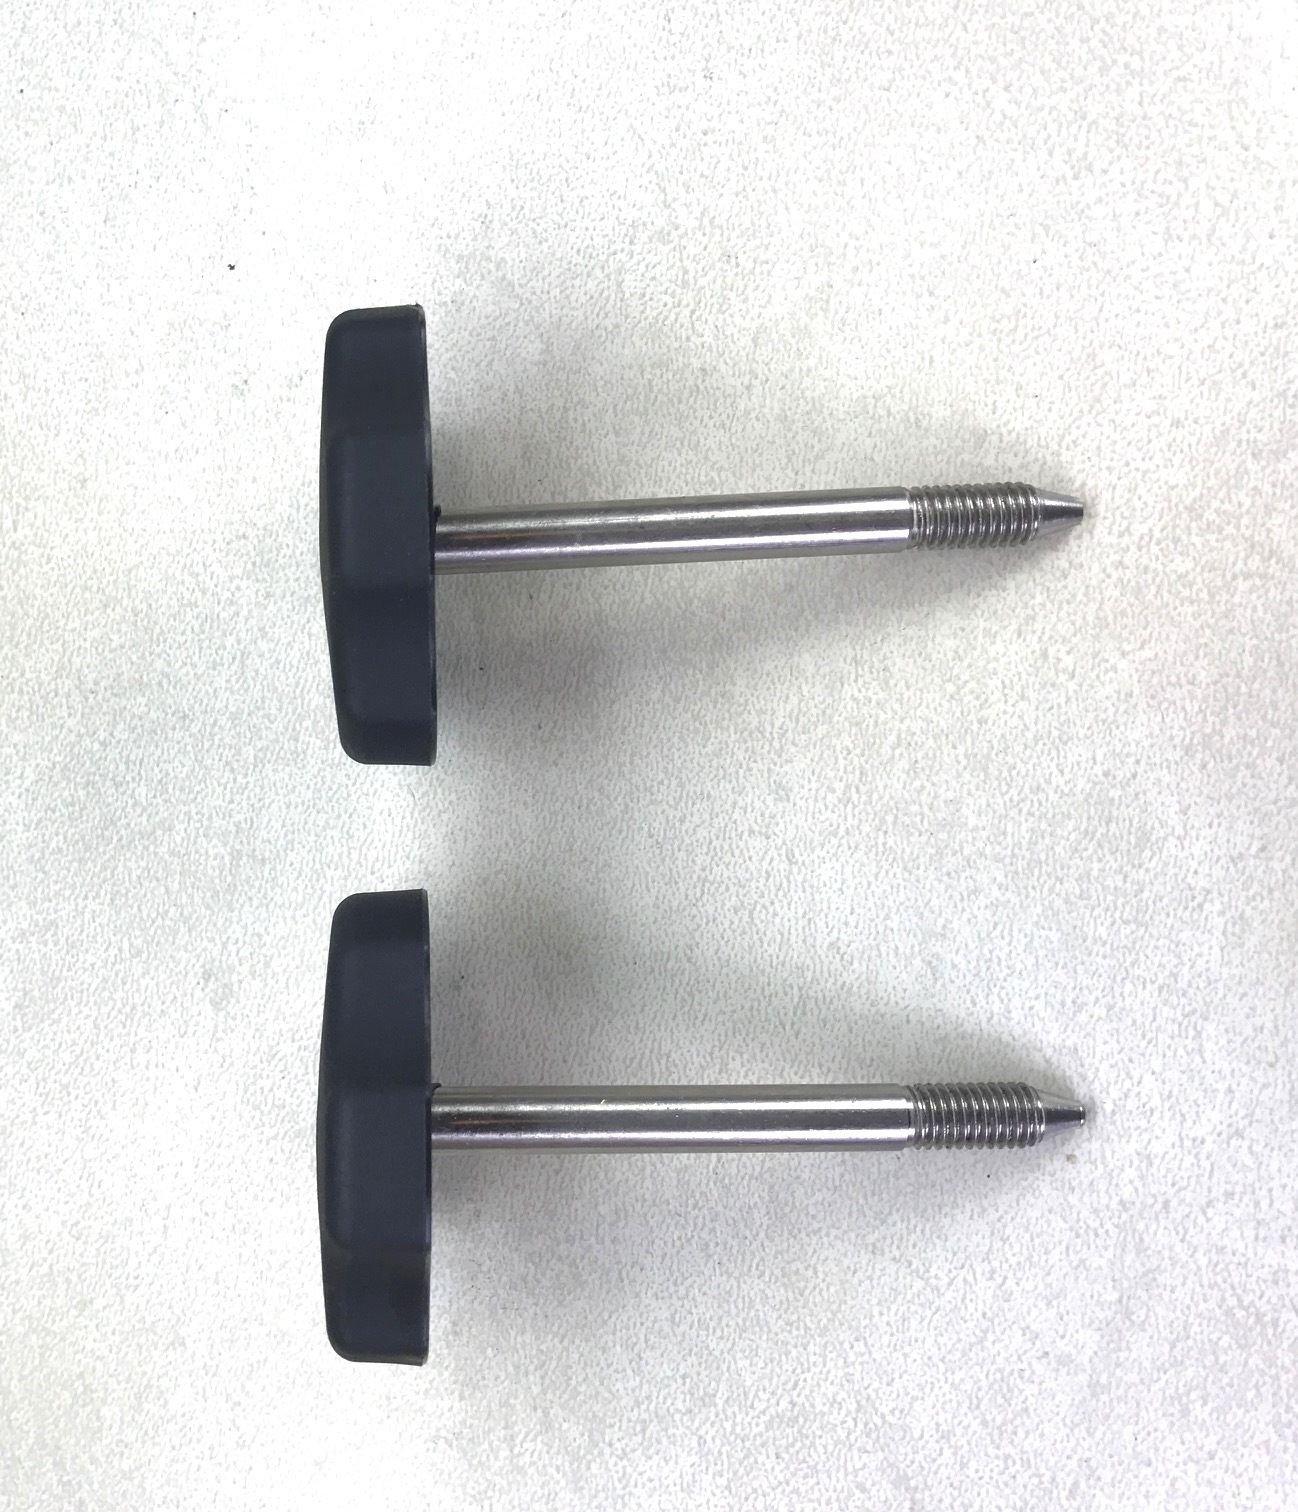 2 ea 2007 to 2017 / Jeep Wrangler TJ / Soft Top Door Surround Knob With Pin(set)